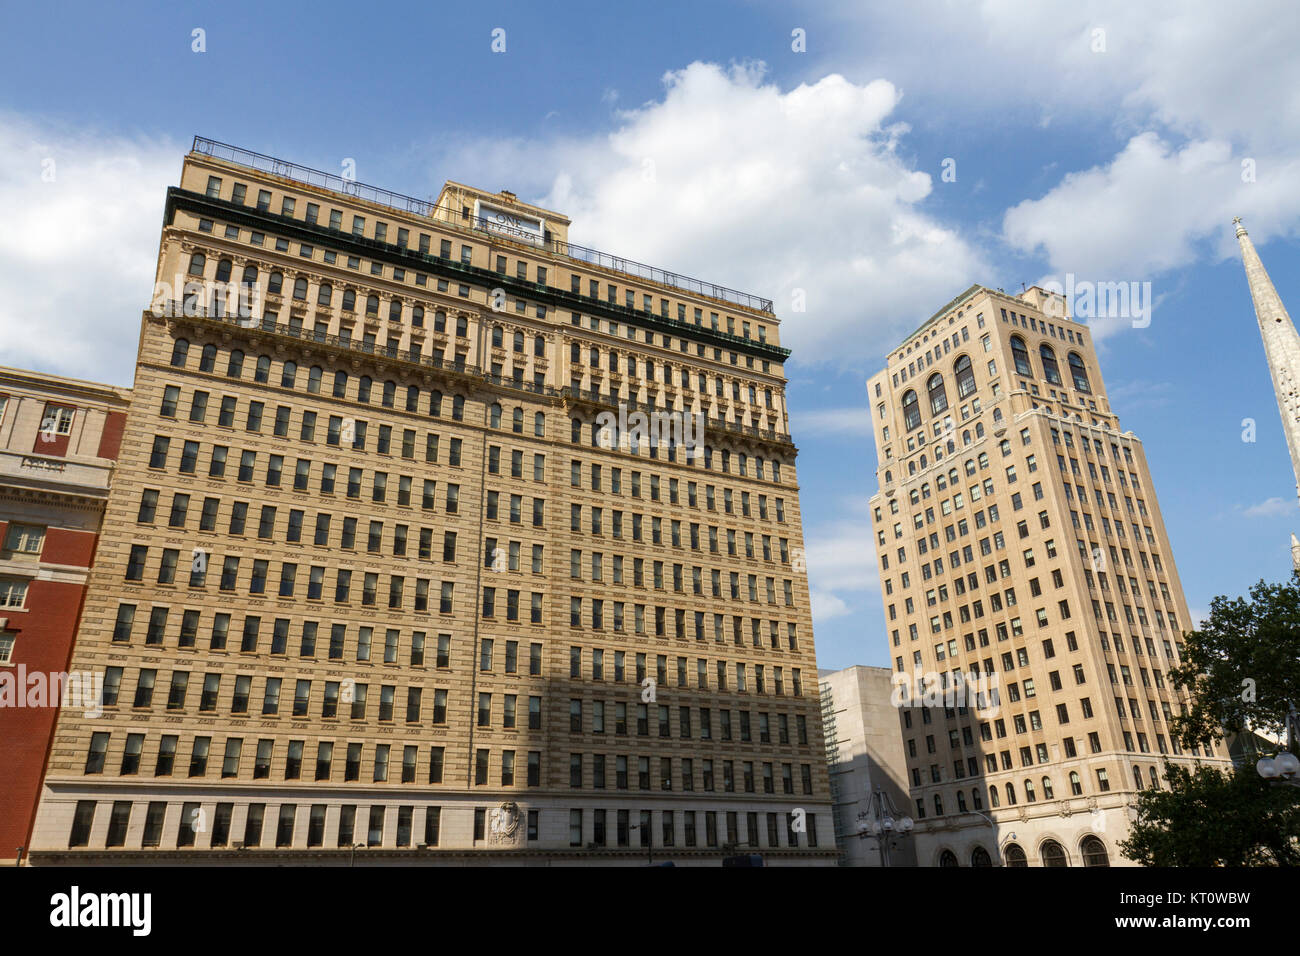 One City Plaza building (L) and the Aloft Philadelphia Downtown hotel (R), Philadelphia, Pennsylvania, United States. - Stock Image